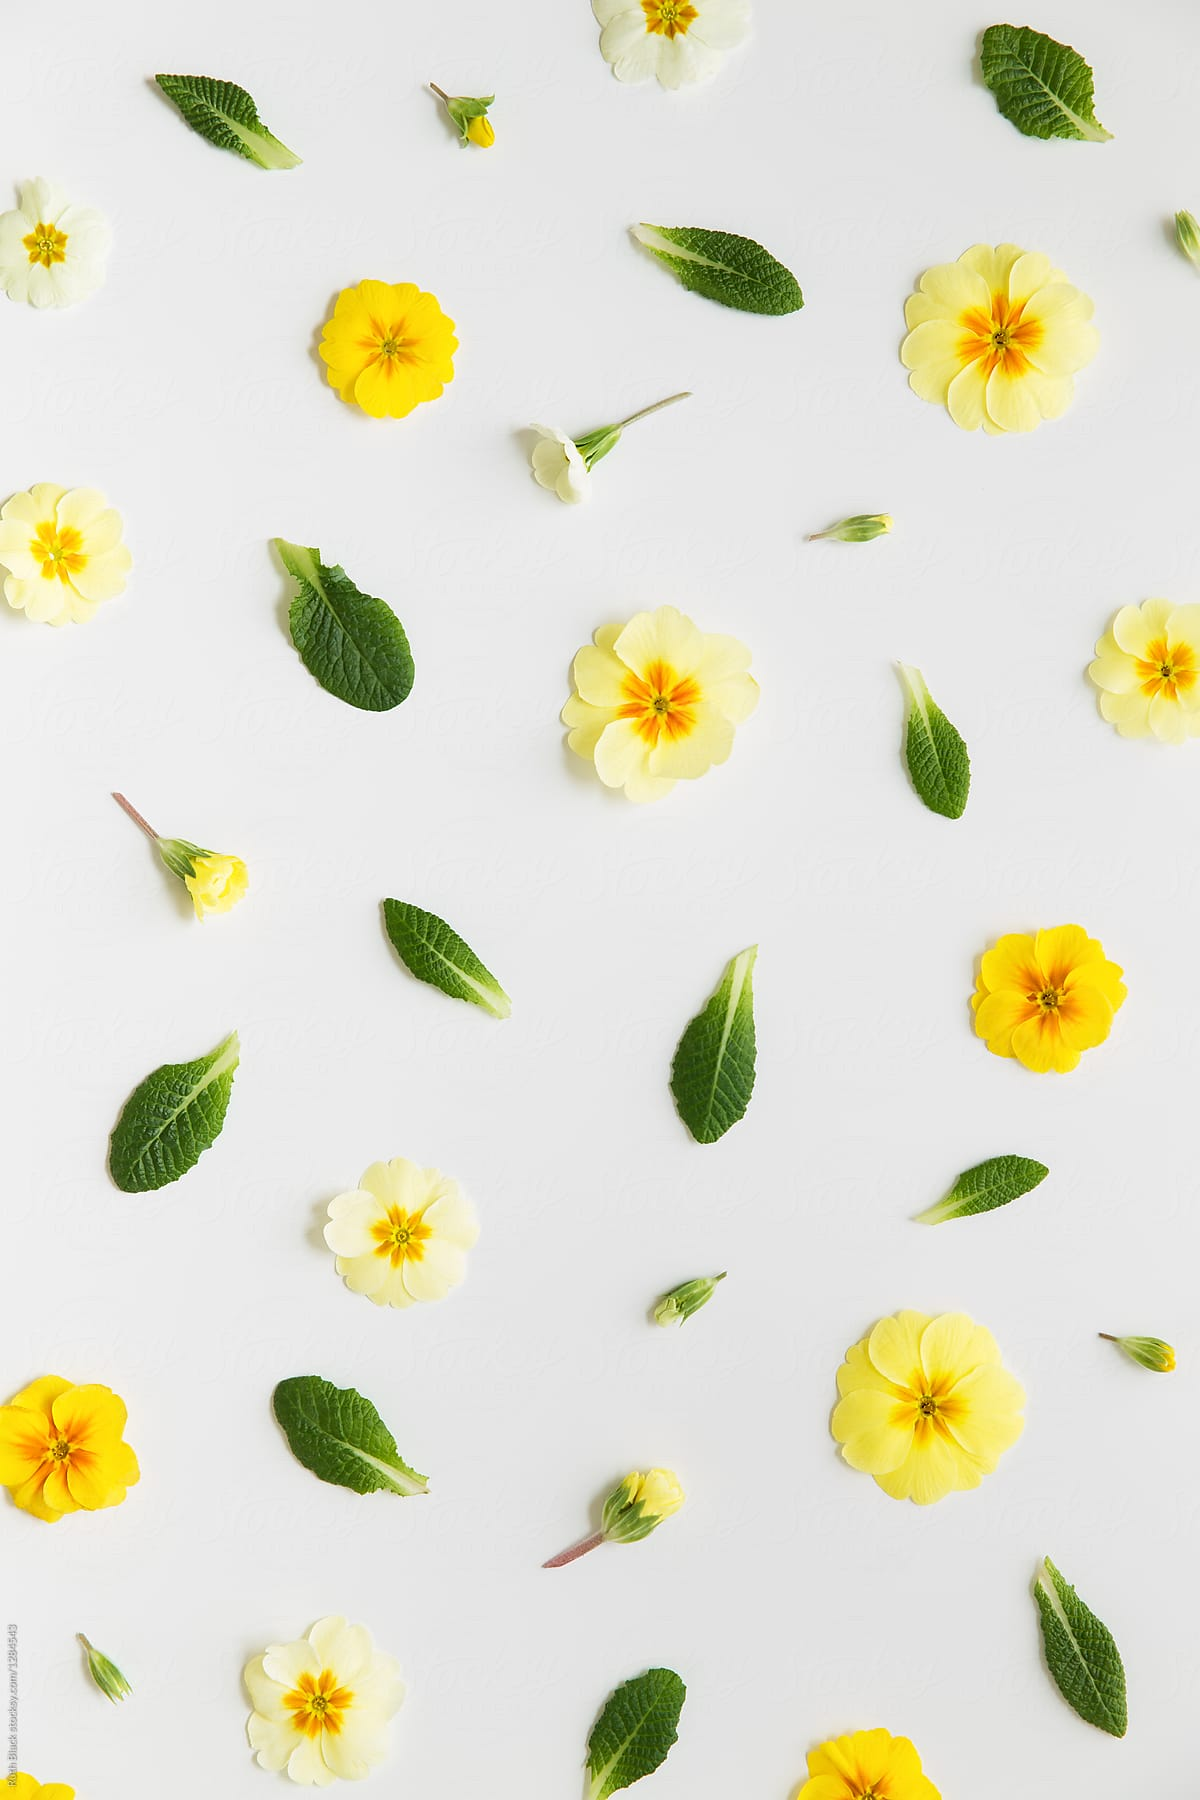 Spring Flower Background By Ruth Black Flower Spring Stocksy